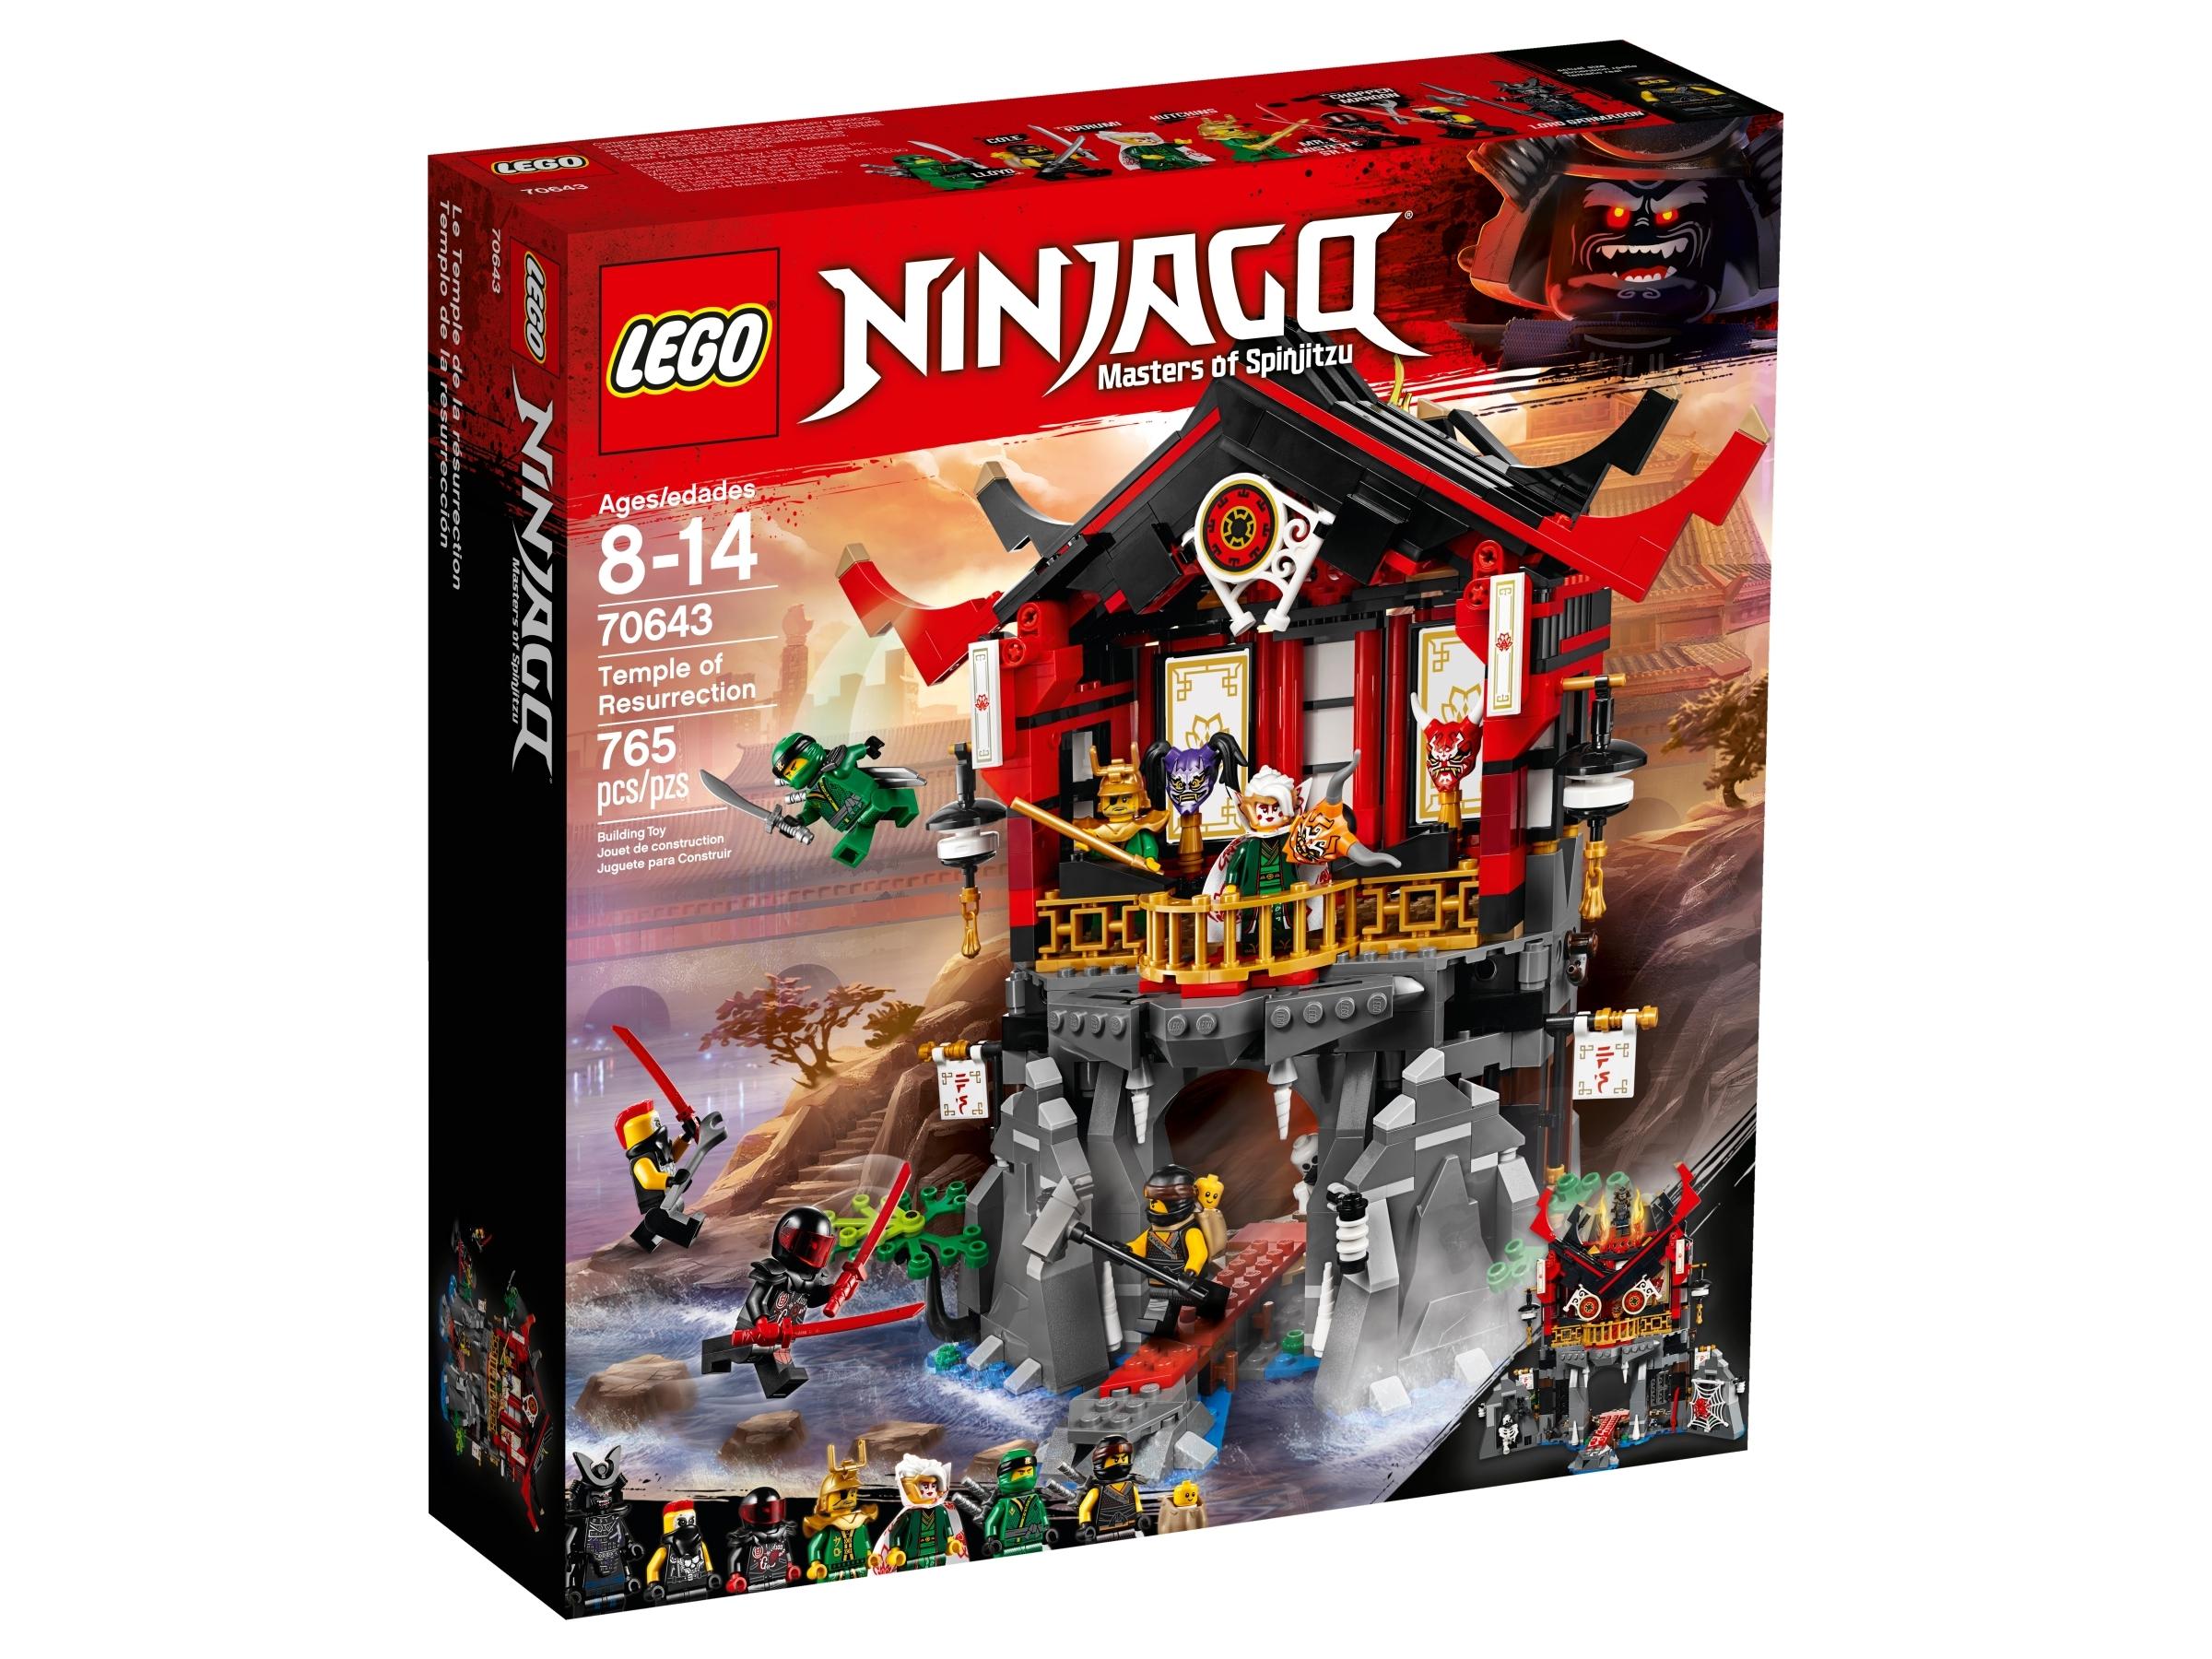 LEGO Ninjago Cole Ninja Minifigure 70643 Mini Fig Sons of Garmadon